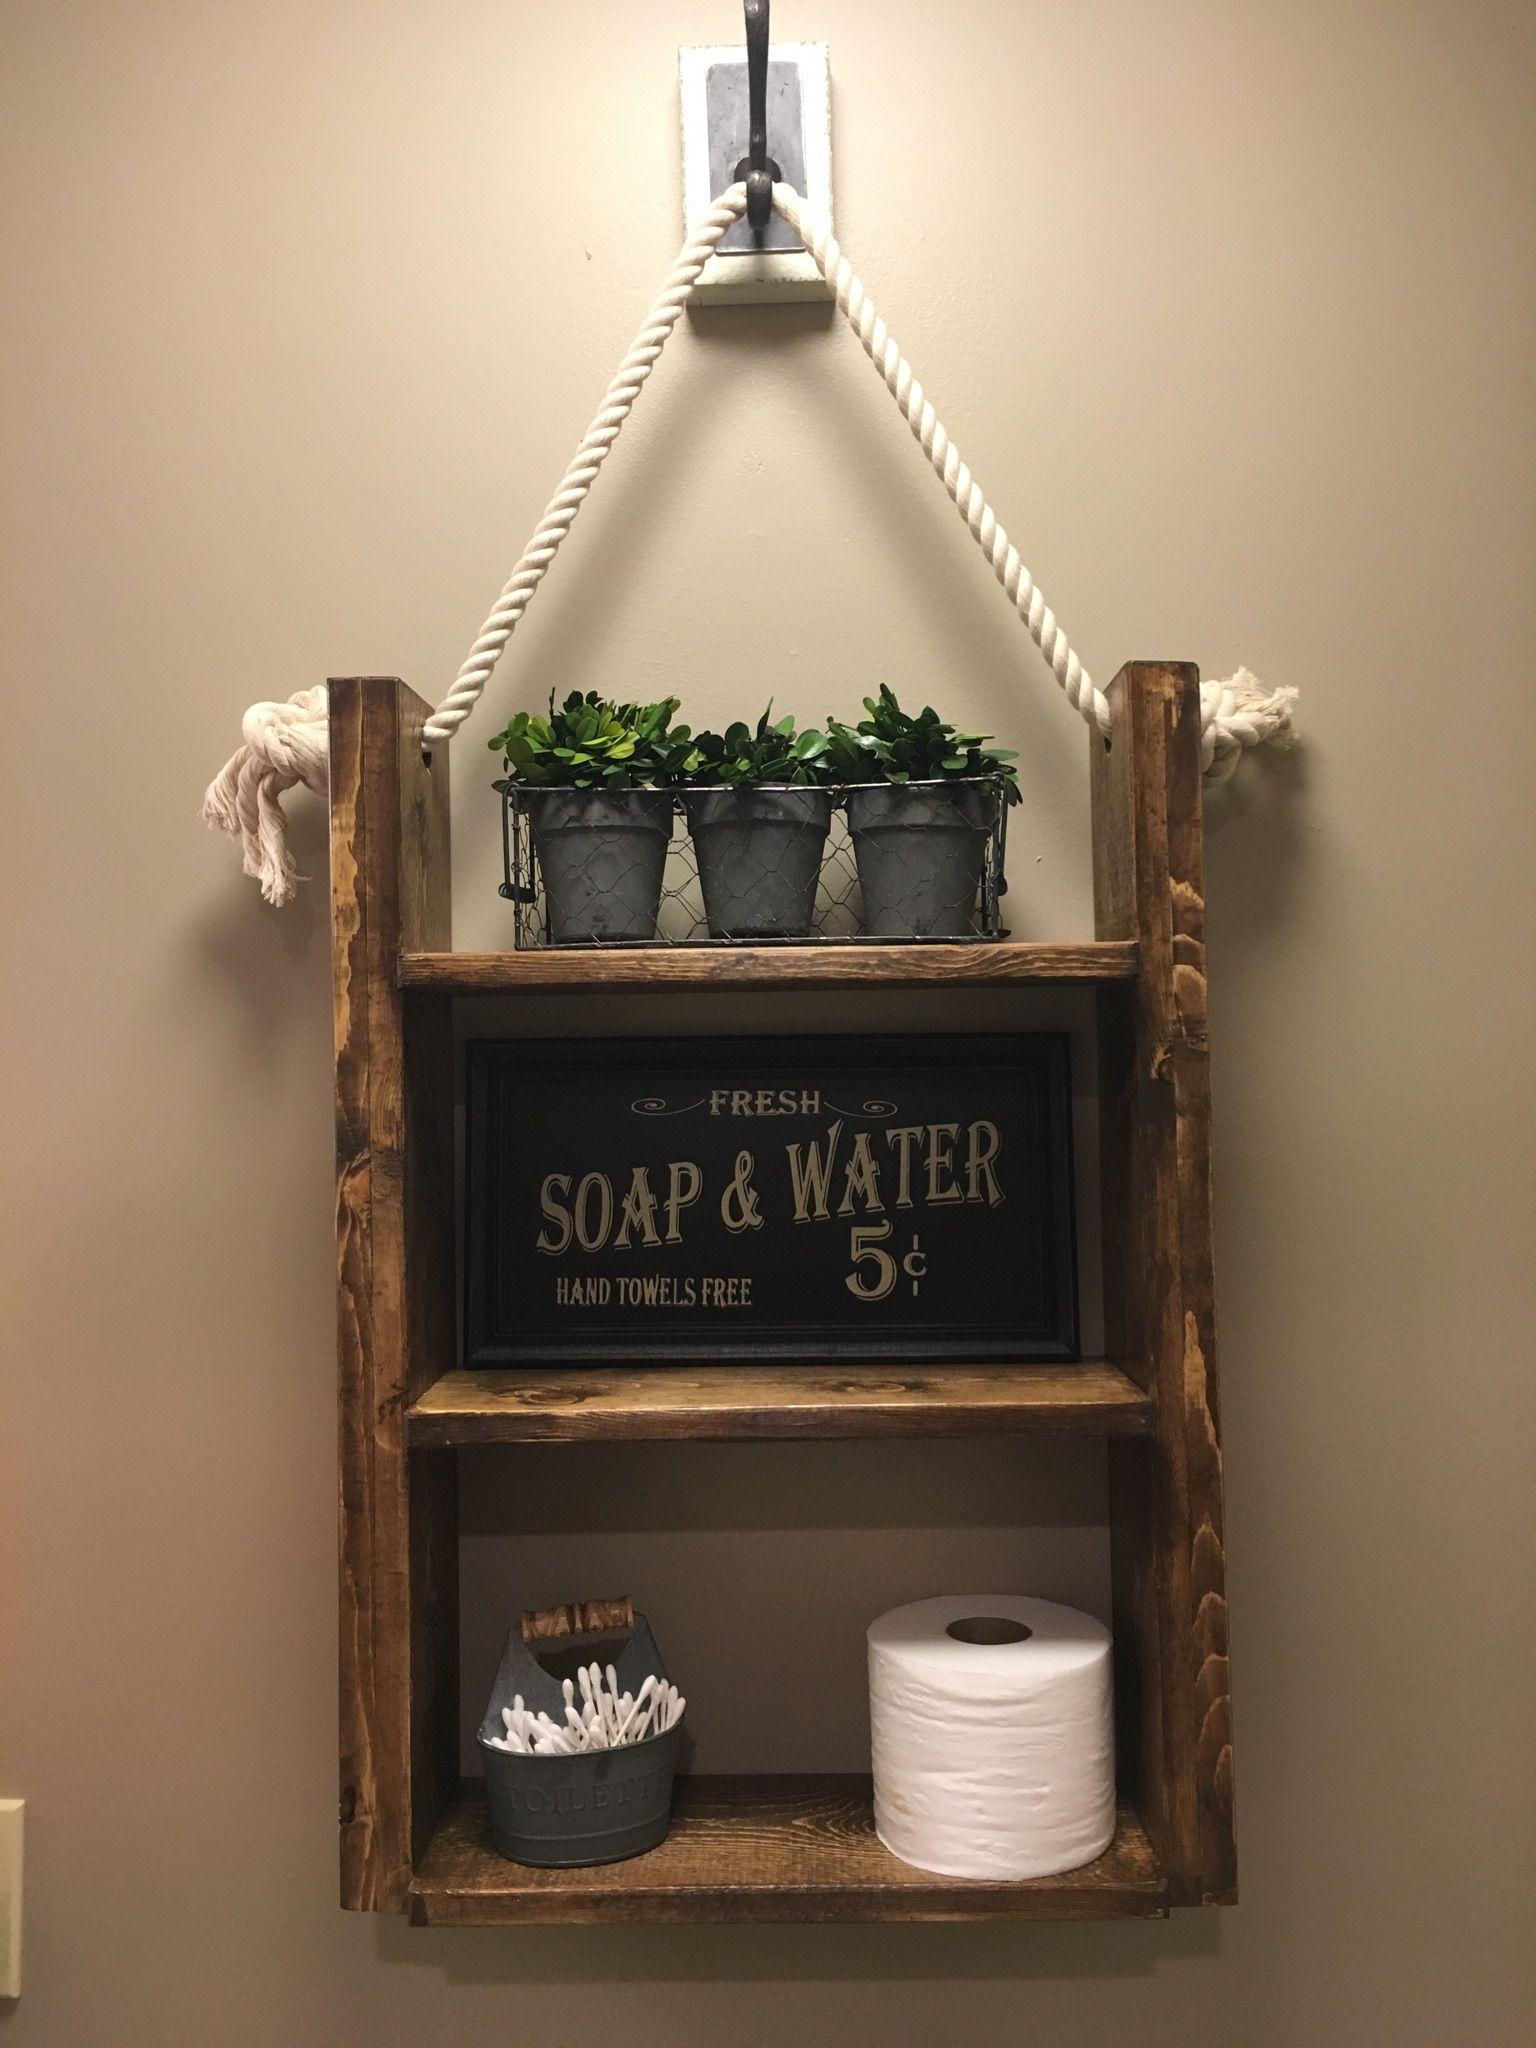 Custom Made Farmhouse Rustic Bathroom Shelf Hanging